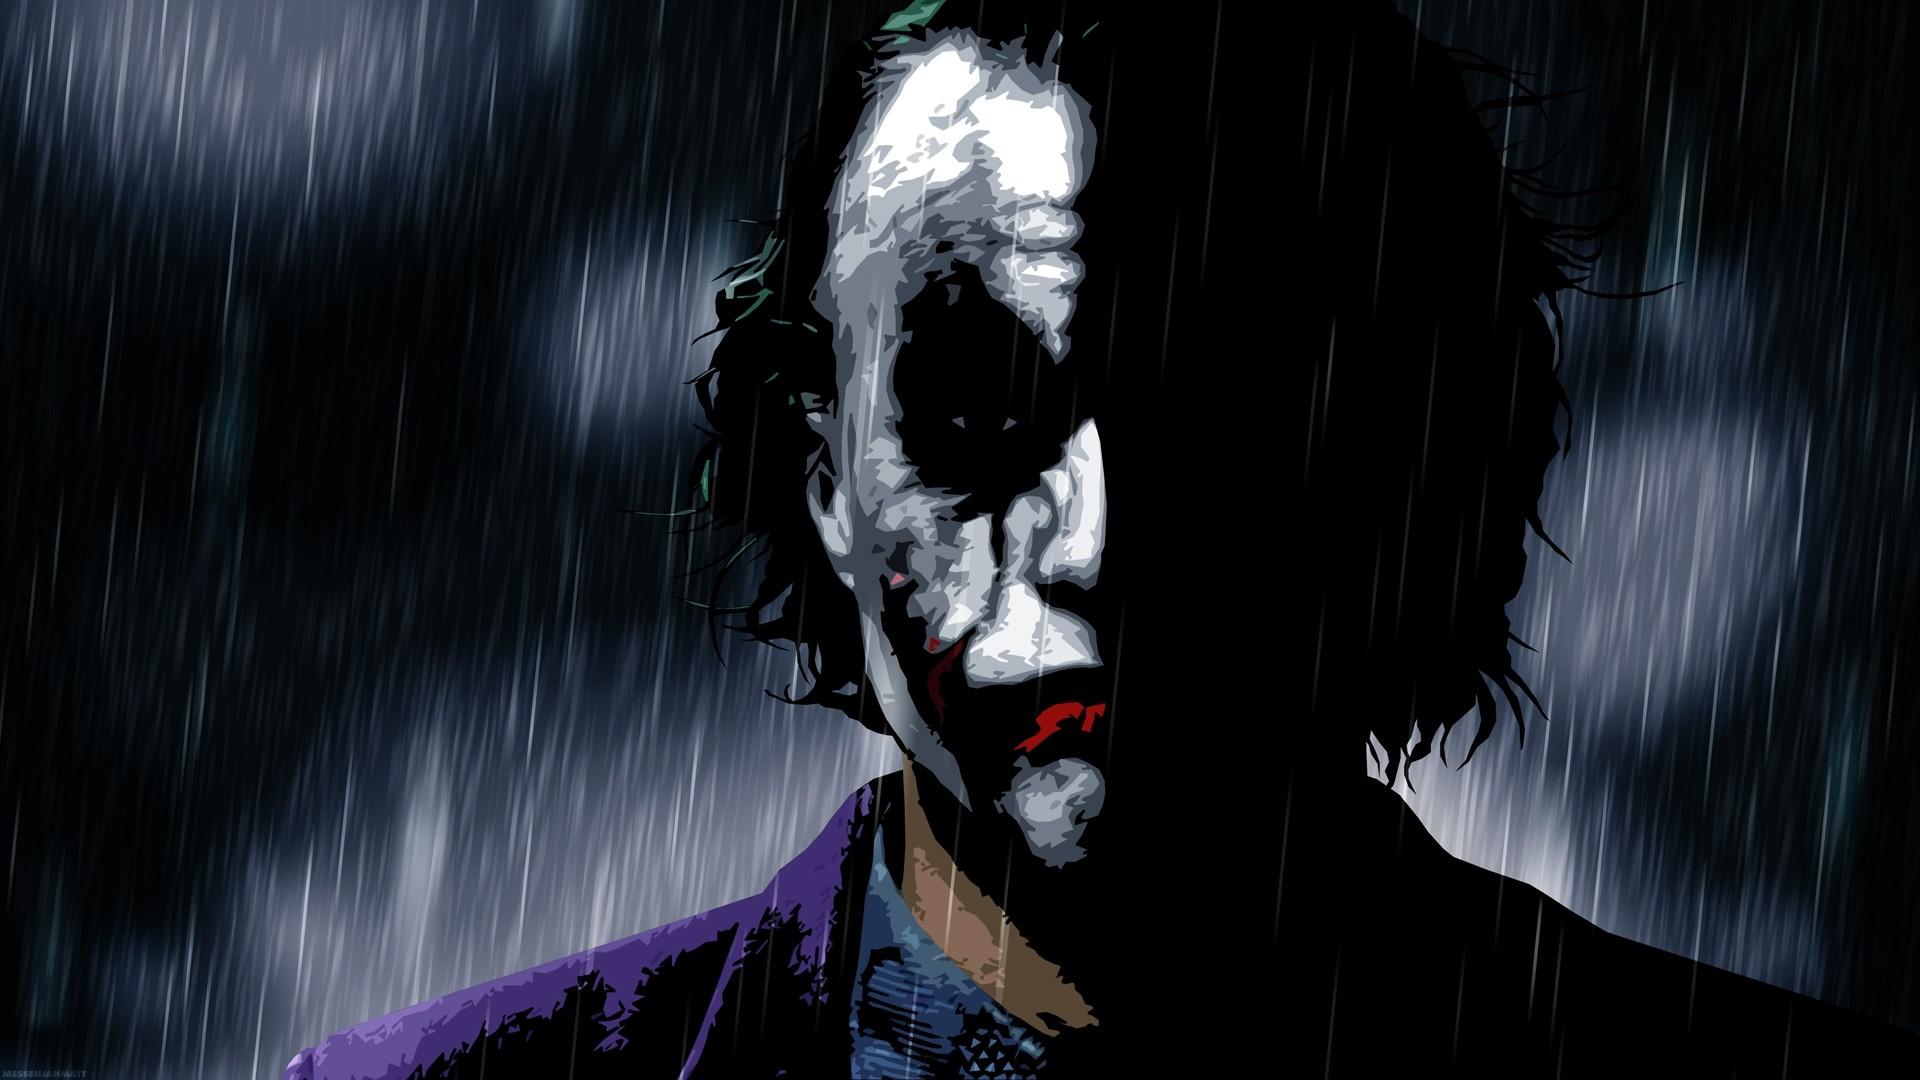 … 1080p hd wallpapers; joker wallpaper hd on wallpaperget com …